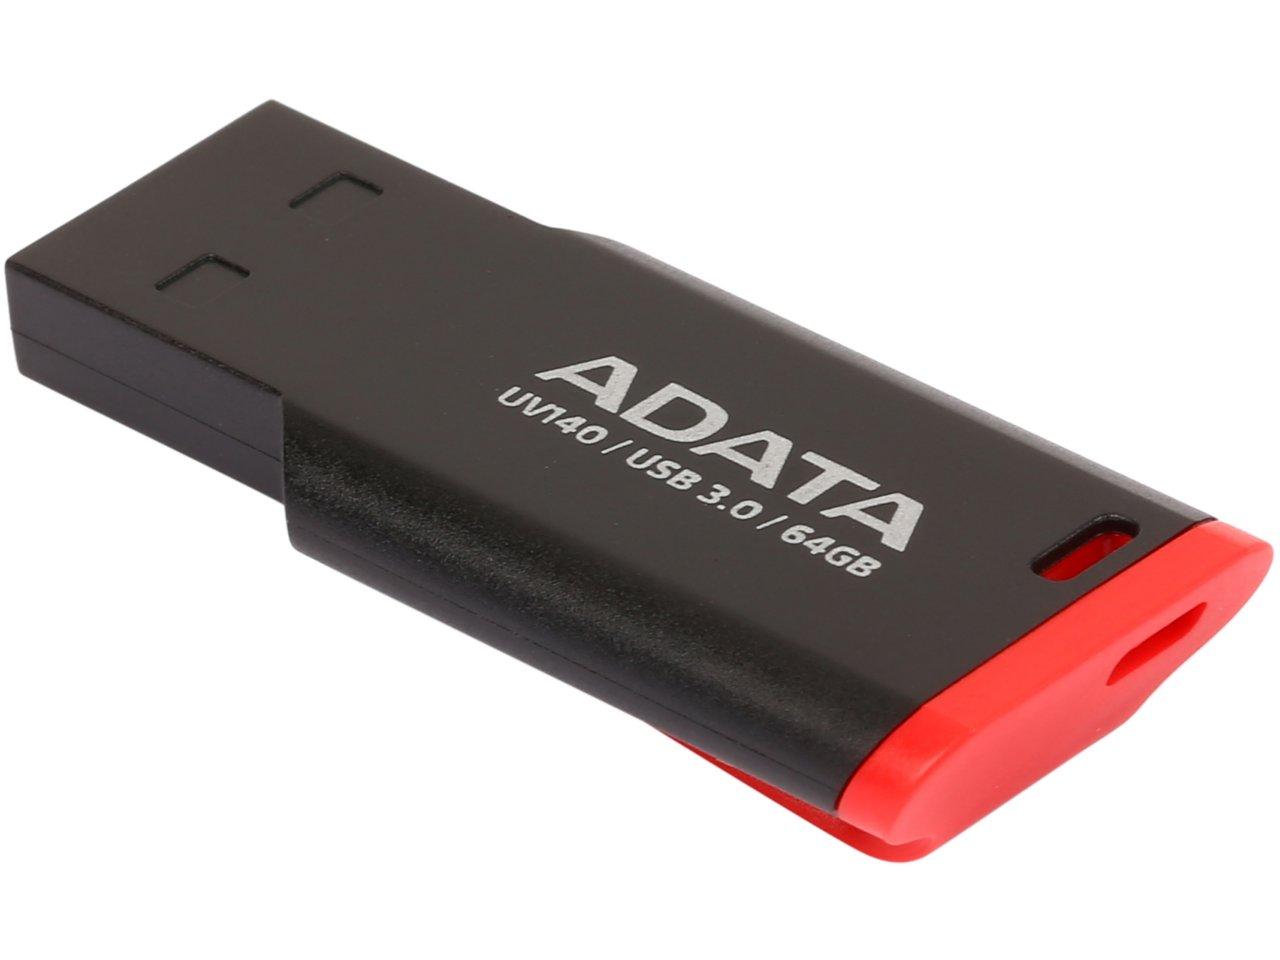 64 GB ADATA DashDrive UV140 USB 3.0 Flash Drive for $11.69 AC, 64 GB ADATA DashDrive UV131 USB 3.0 Flash Drive for $13.49 AC & More @ Newegg.com